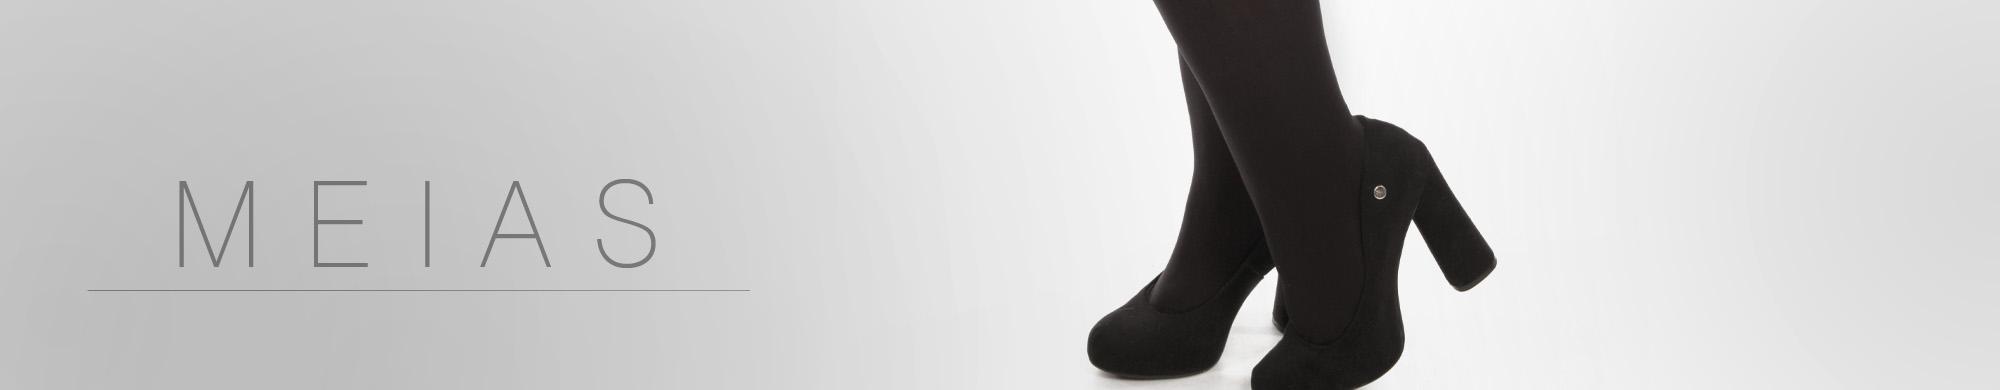 Banner-meias